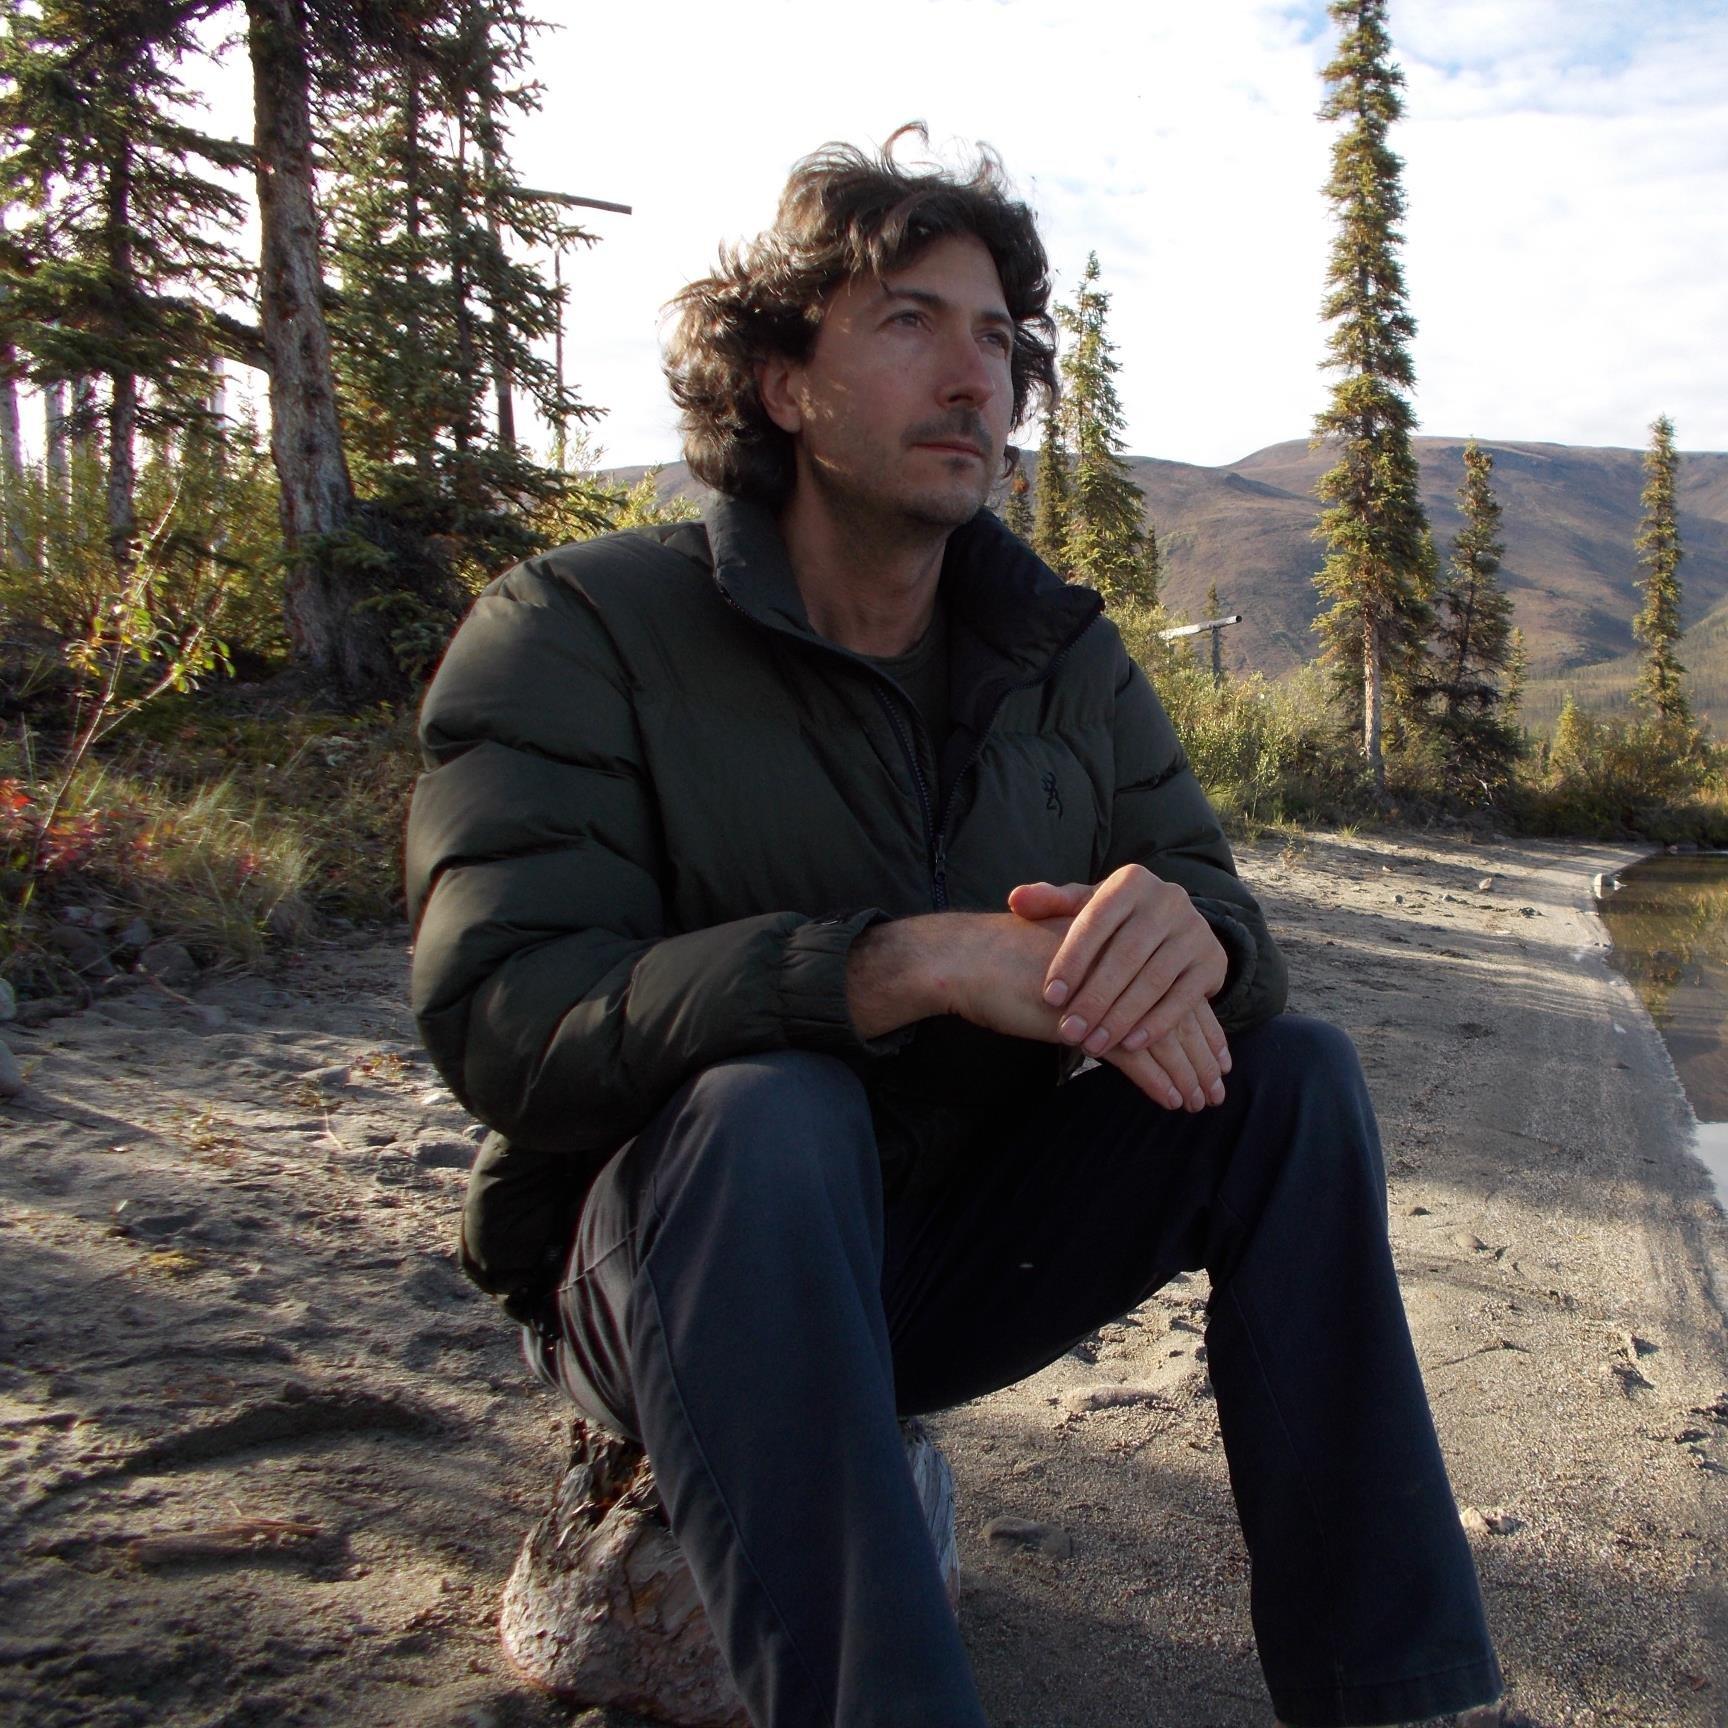 Glenn Villeneuve is sitting on a stone